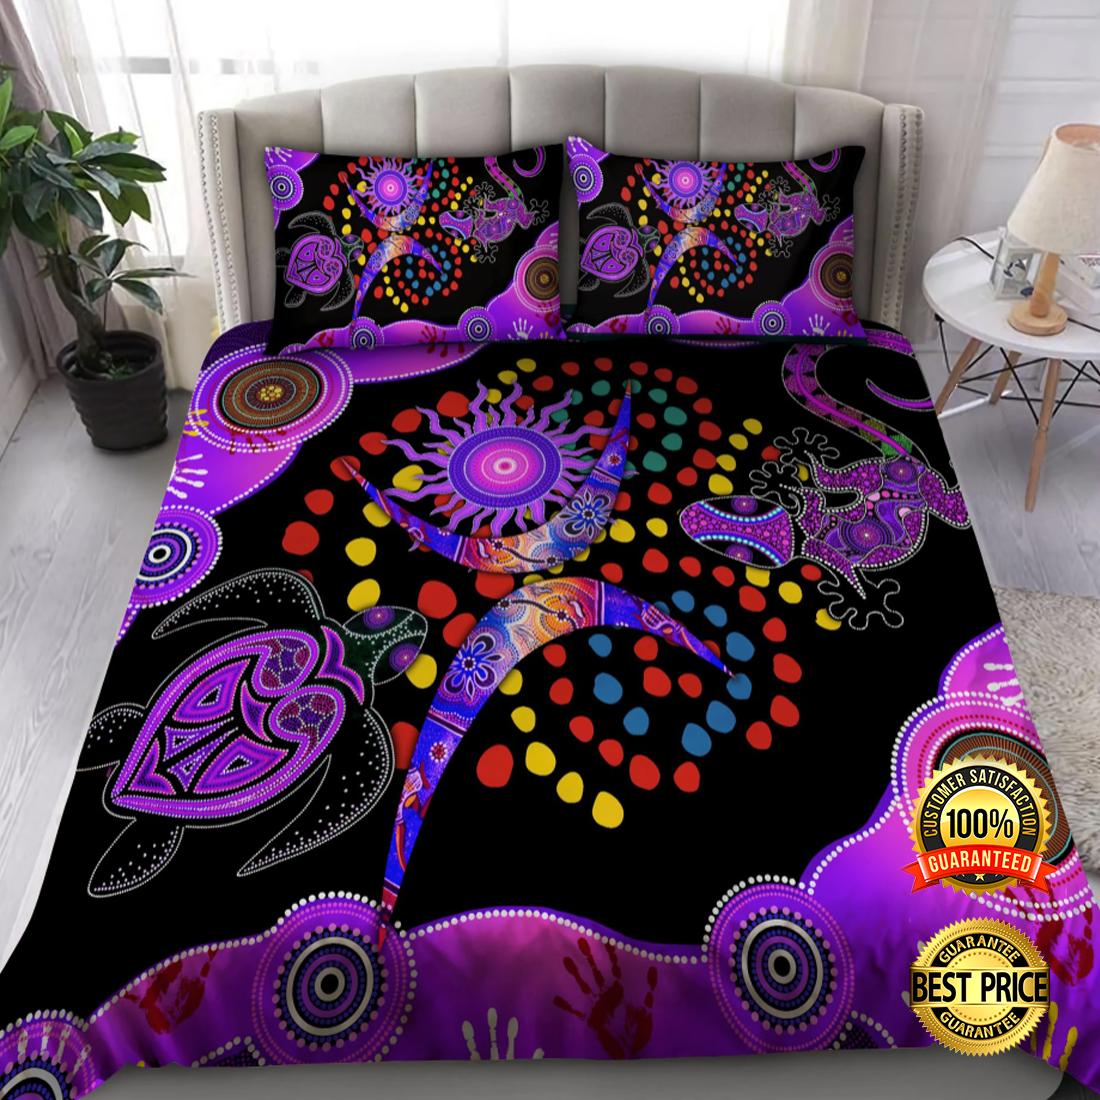 Aboriginal Naidoc week Turtle Lizard bedding set 4